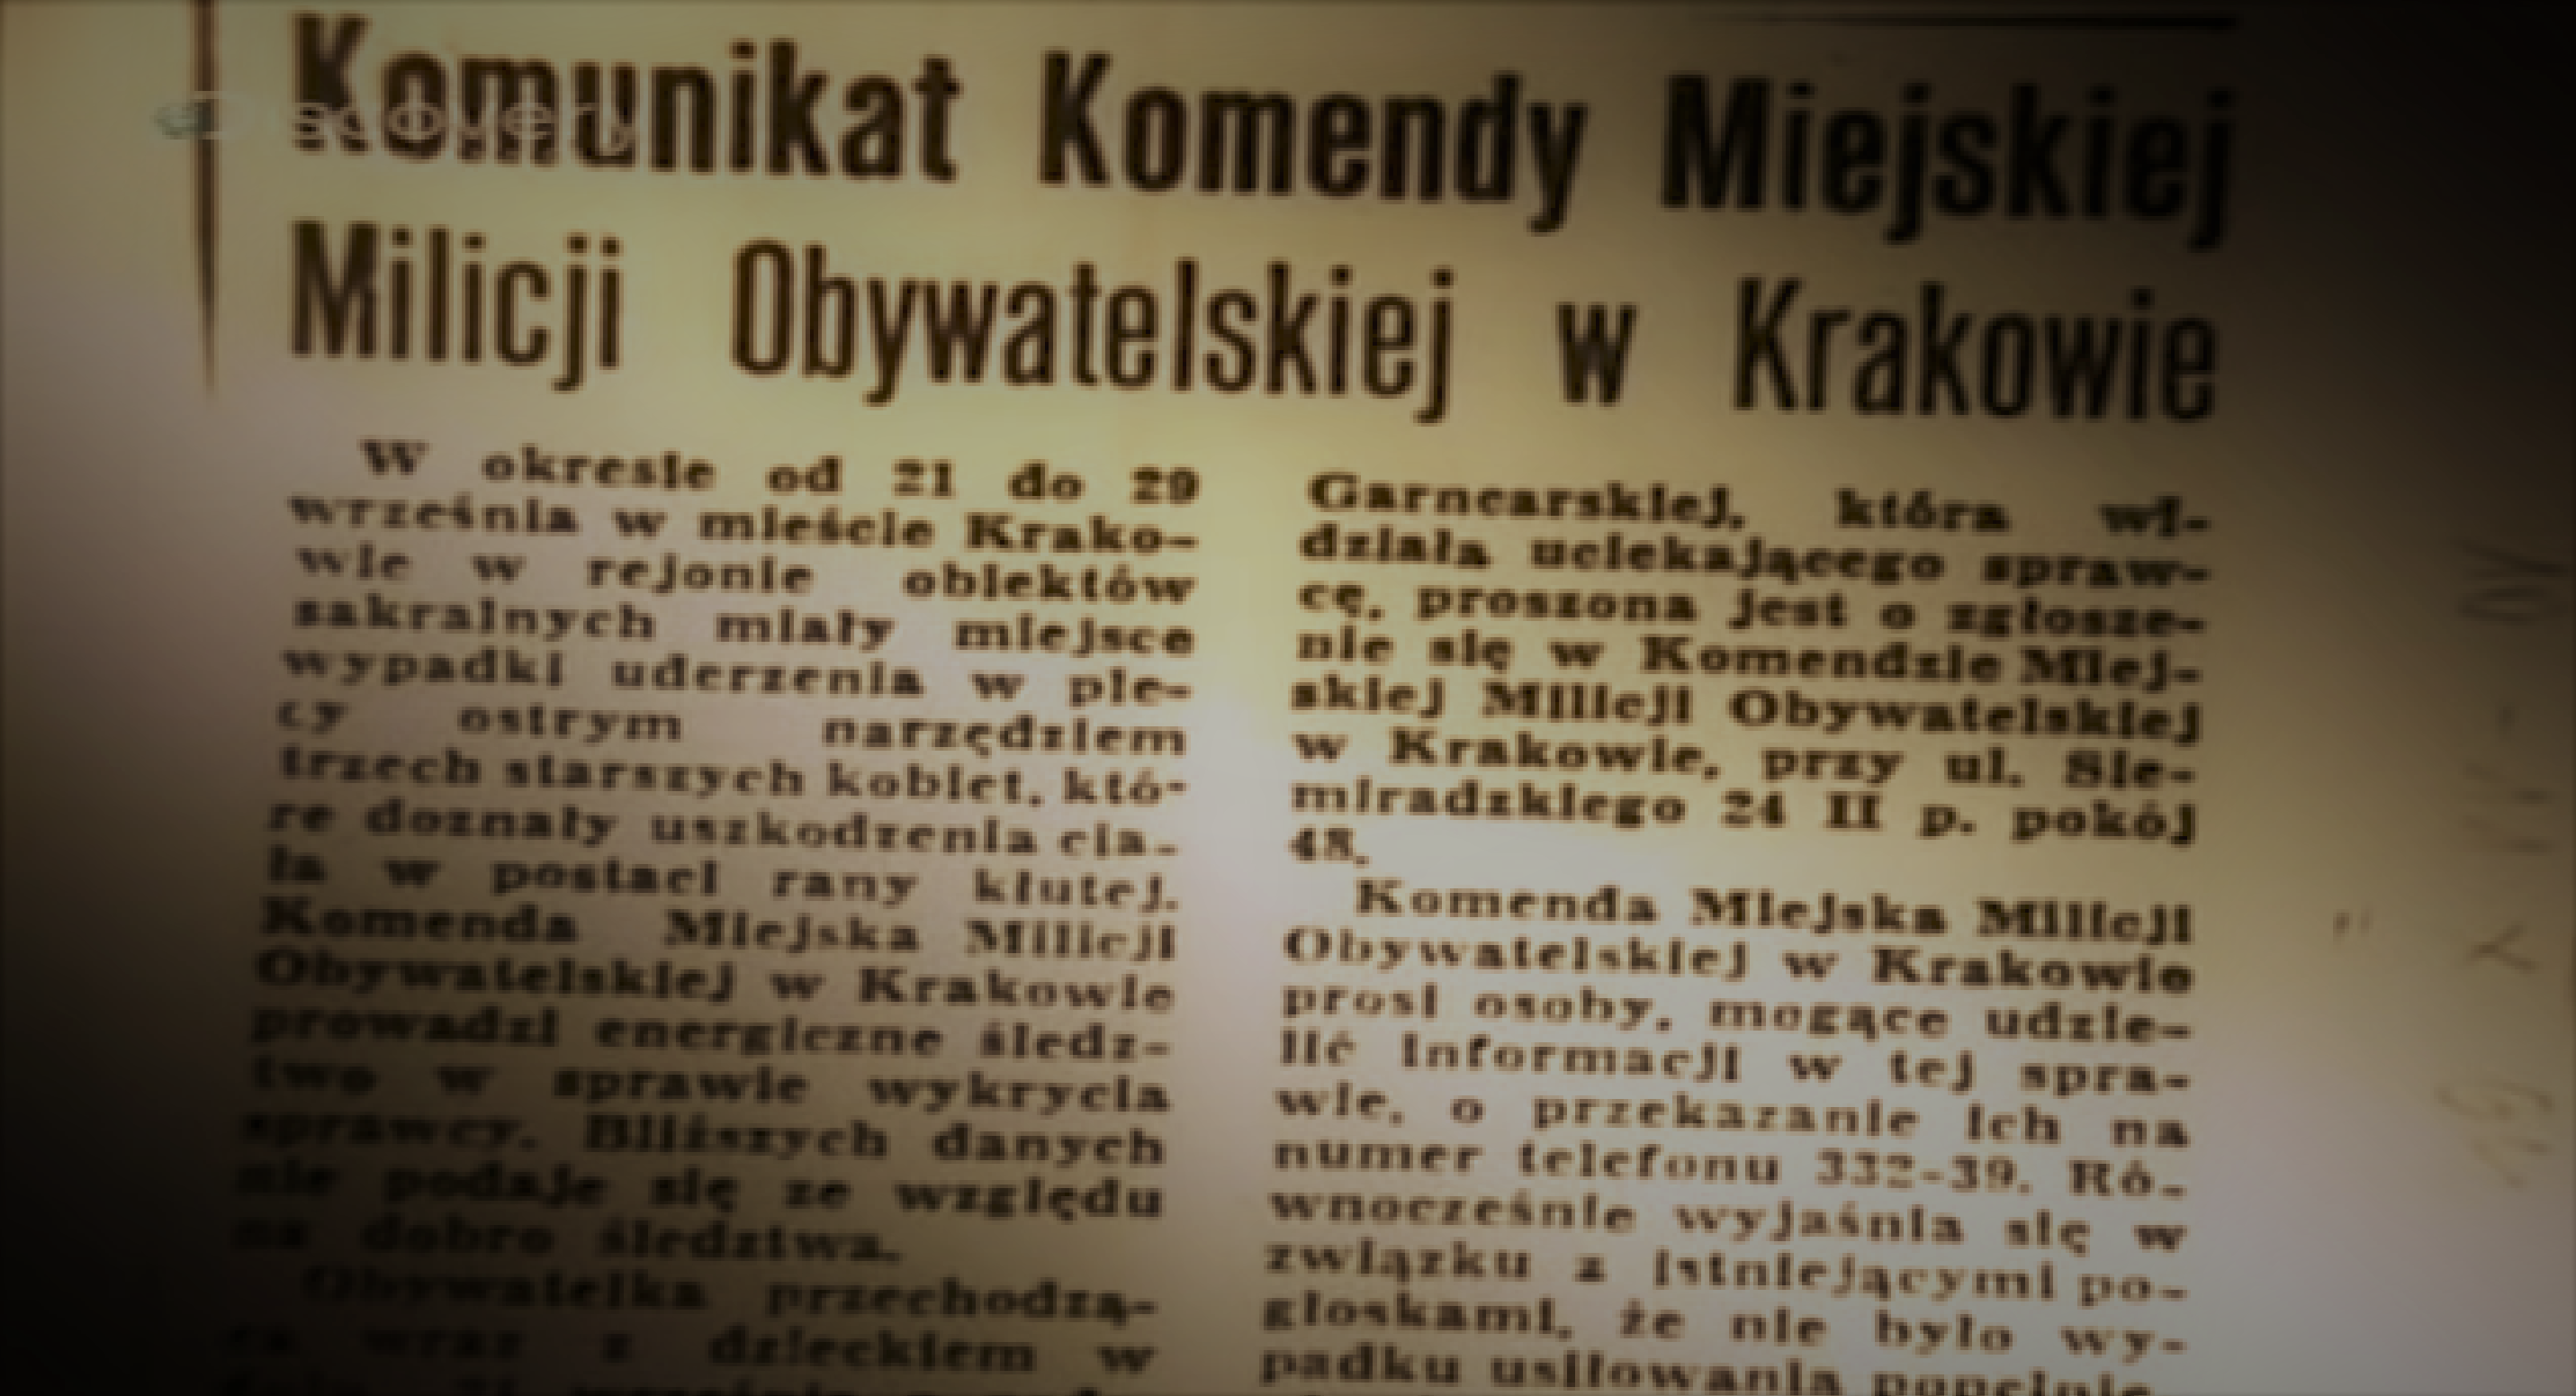 Komunikat Komendy Milicji Obywatelskiej (screenshot - Discovery/YouTube)